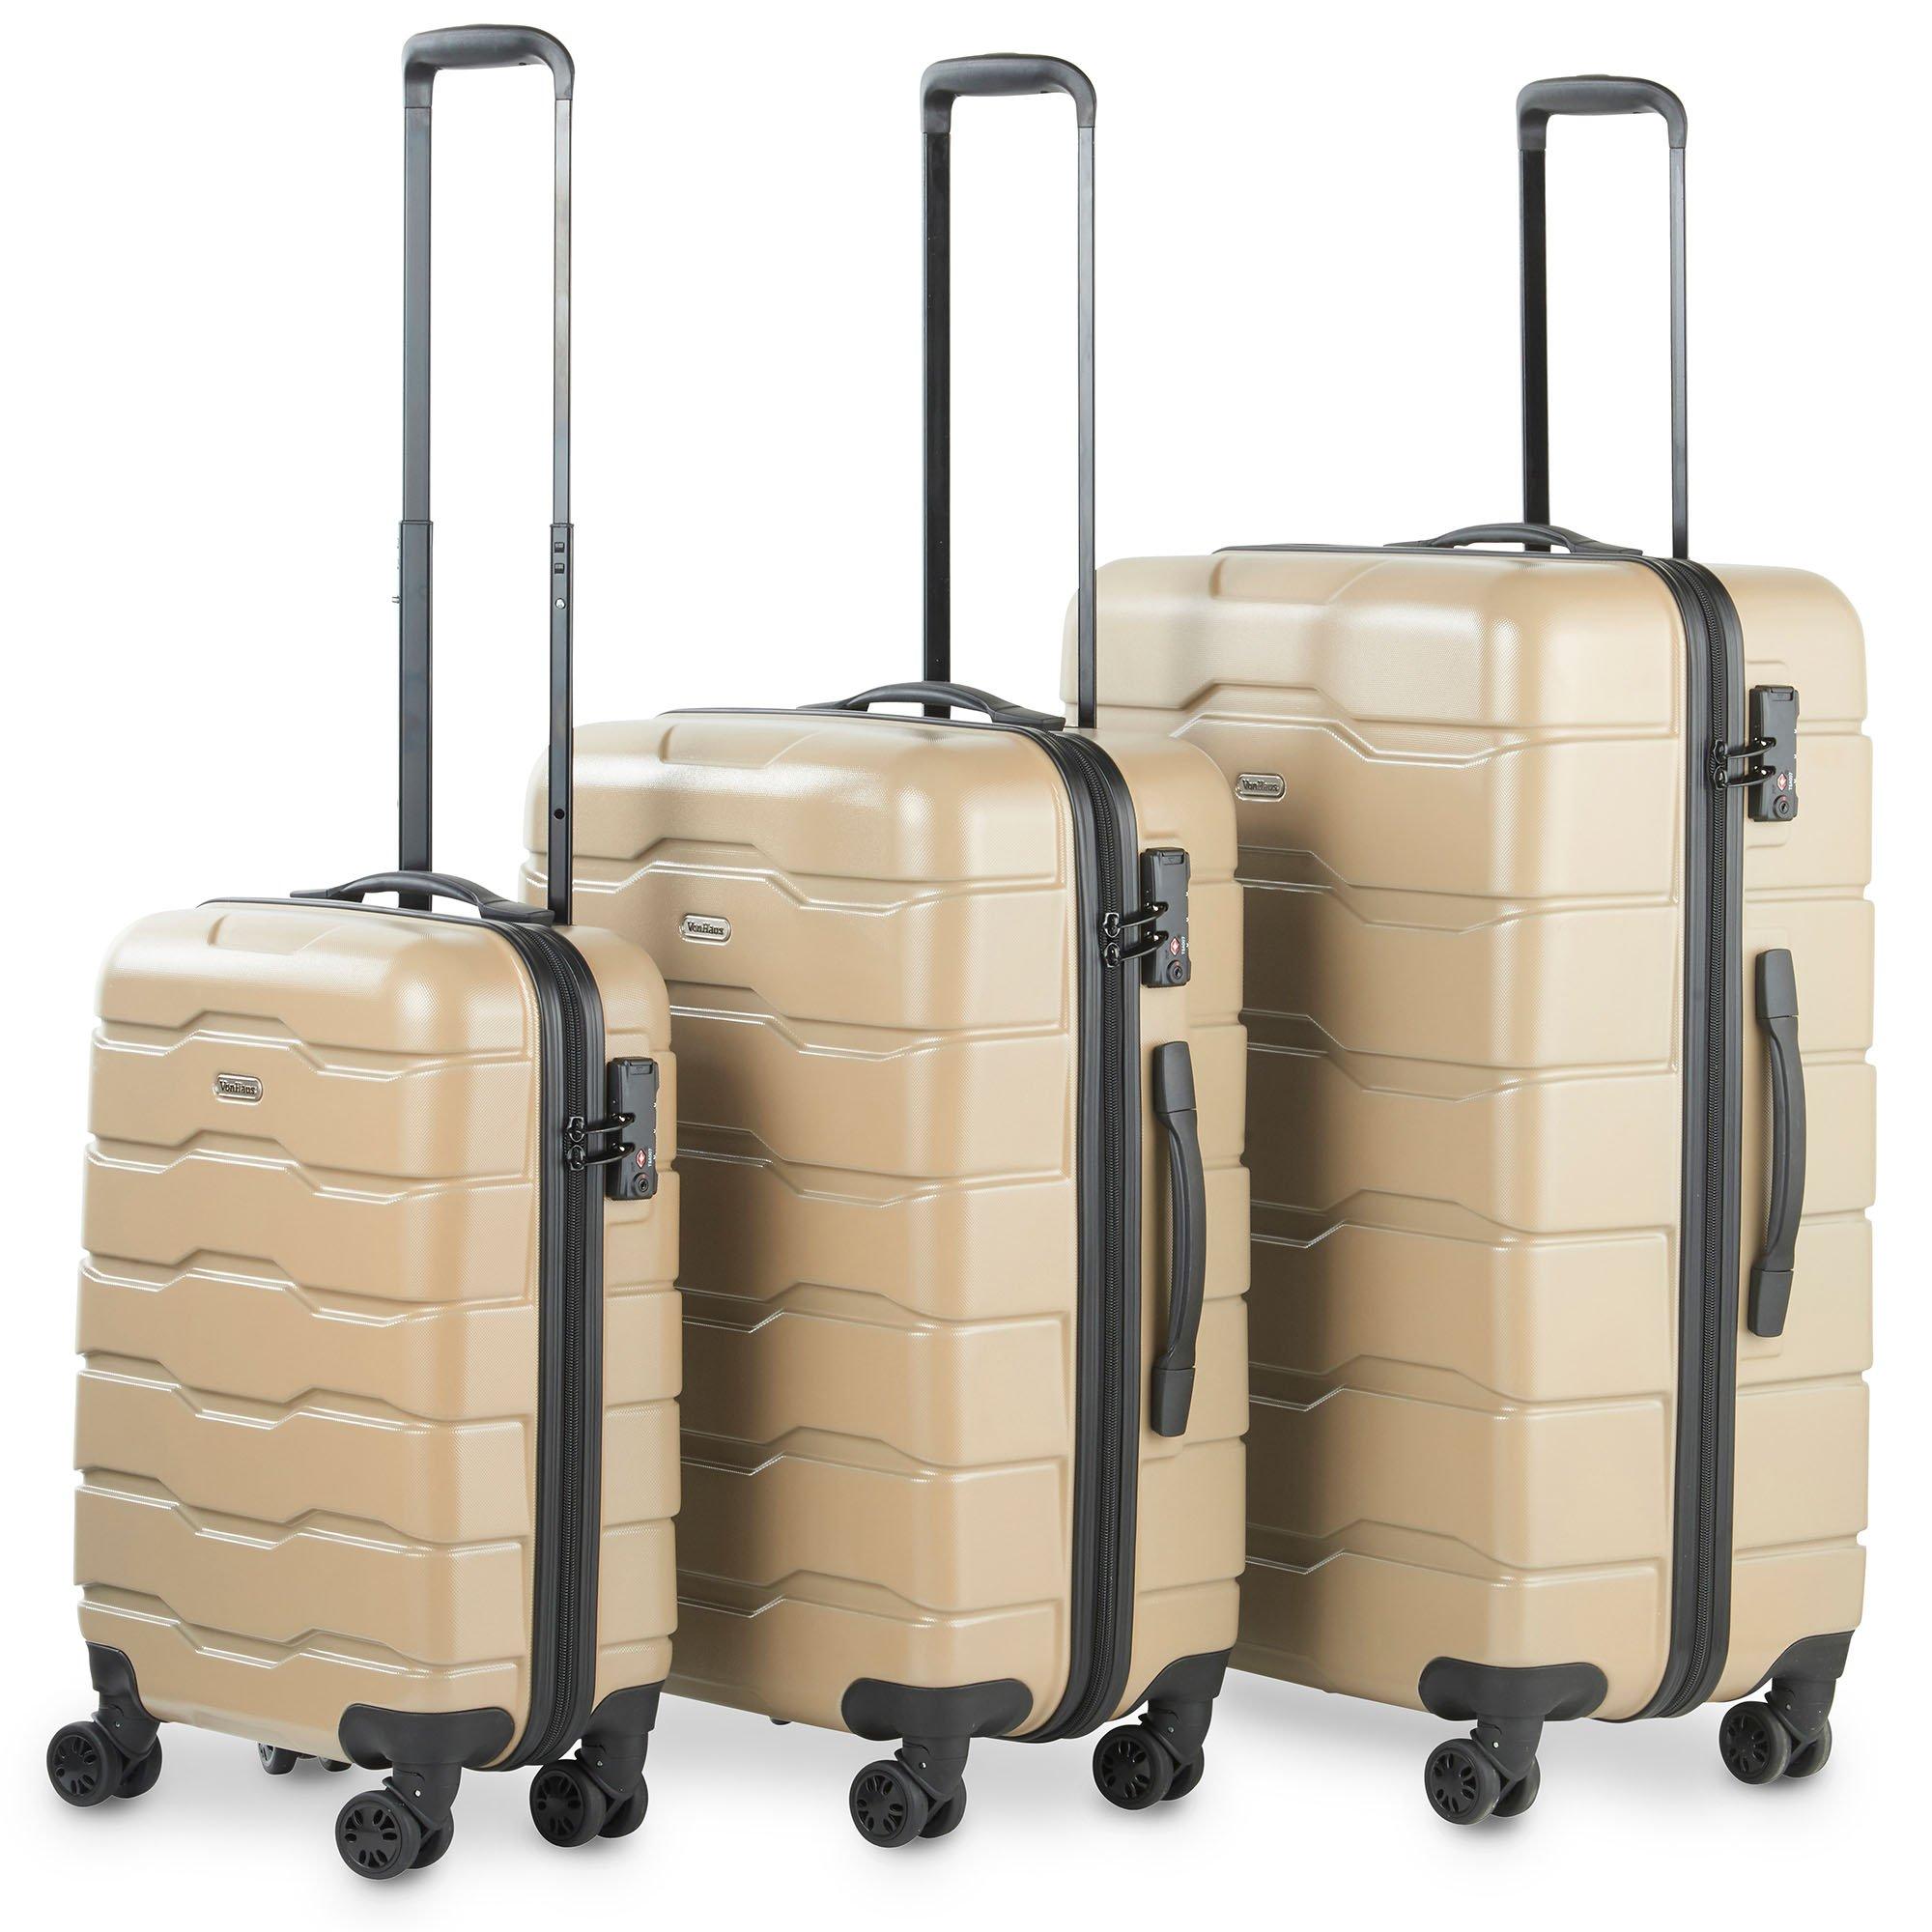 VonHaus Premium 3 Piece Lightweight Luggage Set – Hardshell Travel Suitcase with TSA Integrated Lock, 4 Double Spinner Wheels - Cabin Bag, Medium and Large Case